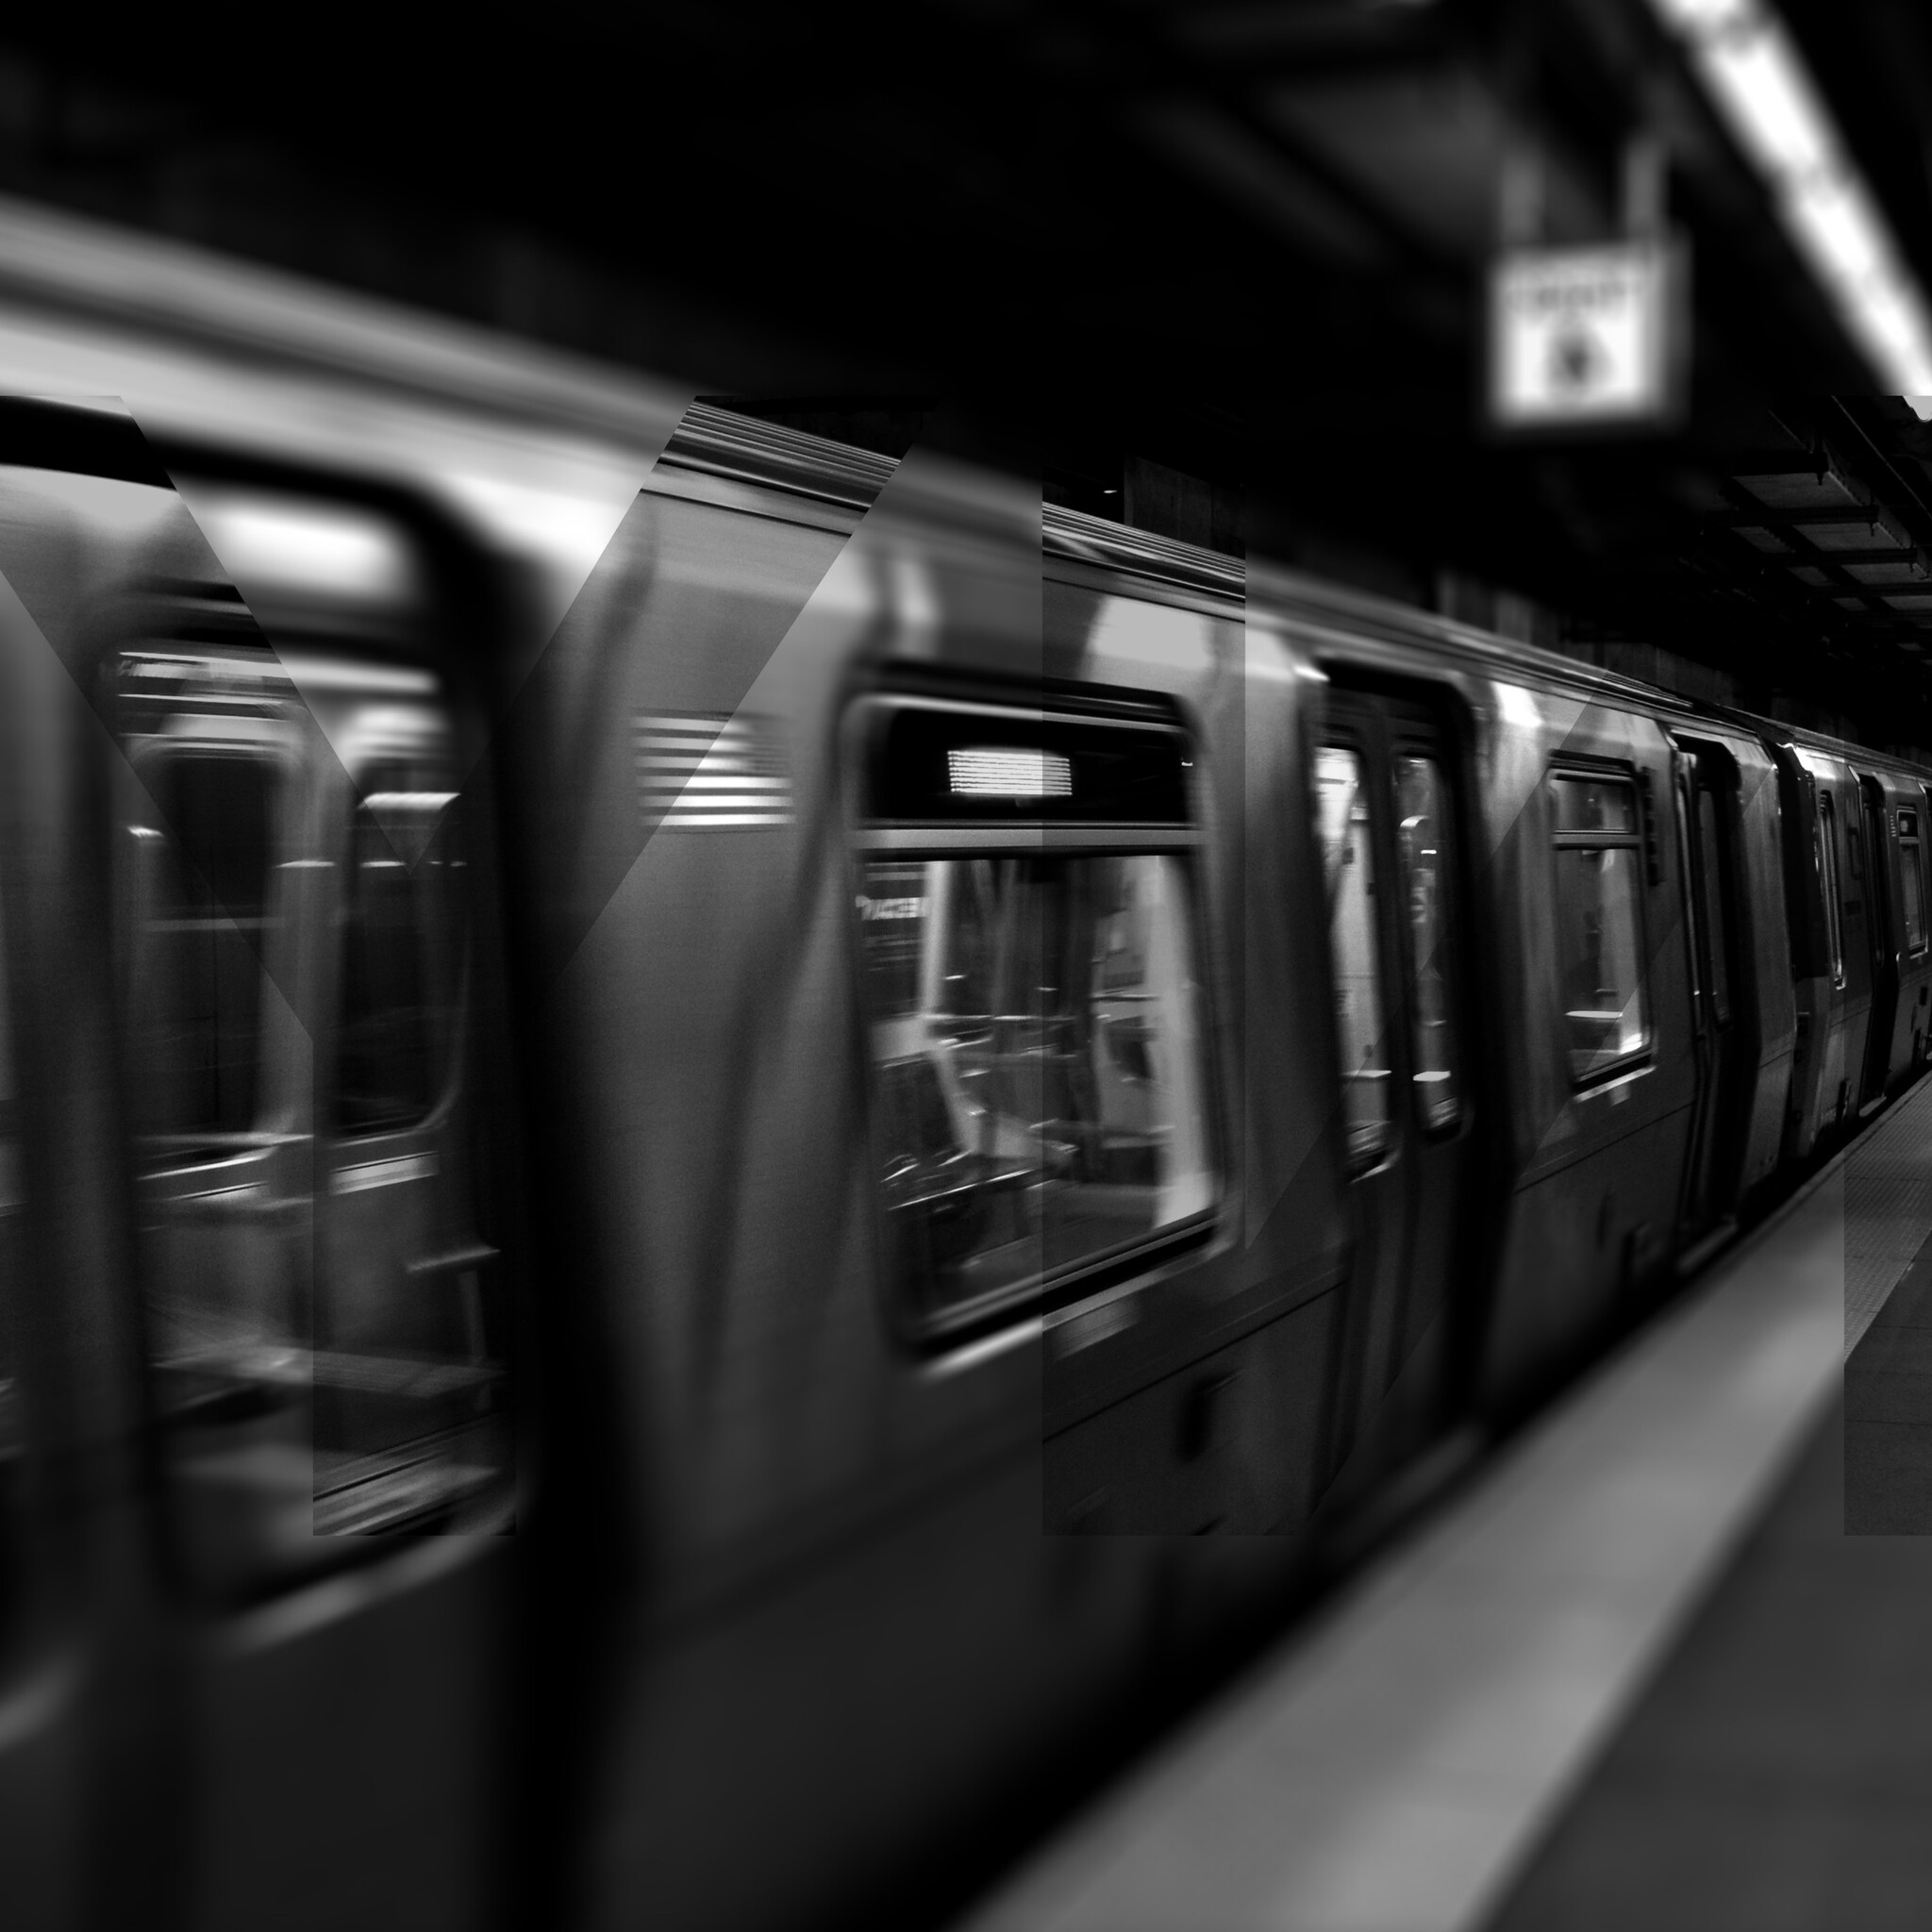 2048x2048 new york city underground subway train ipad air hd 4k new york city underground subway traing voltagebd Images